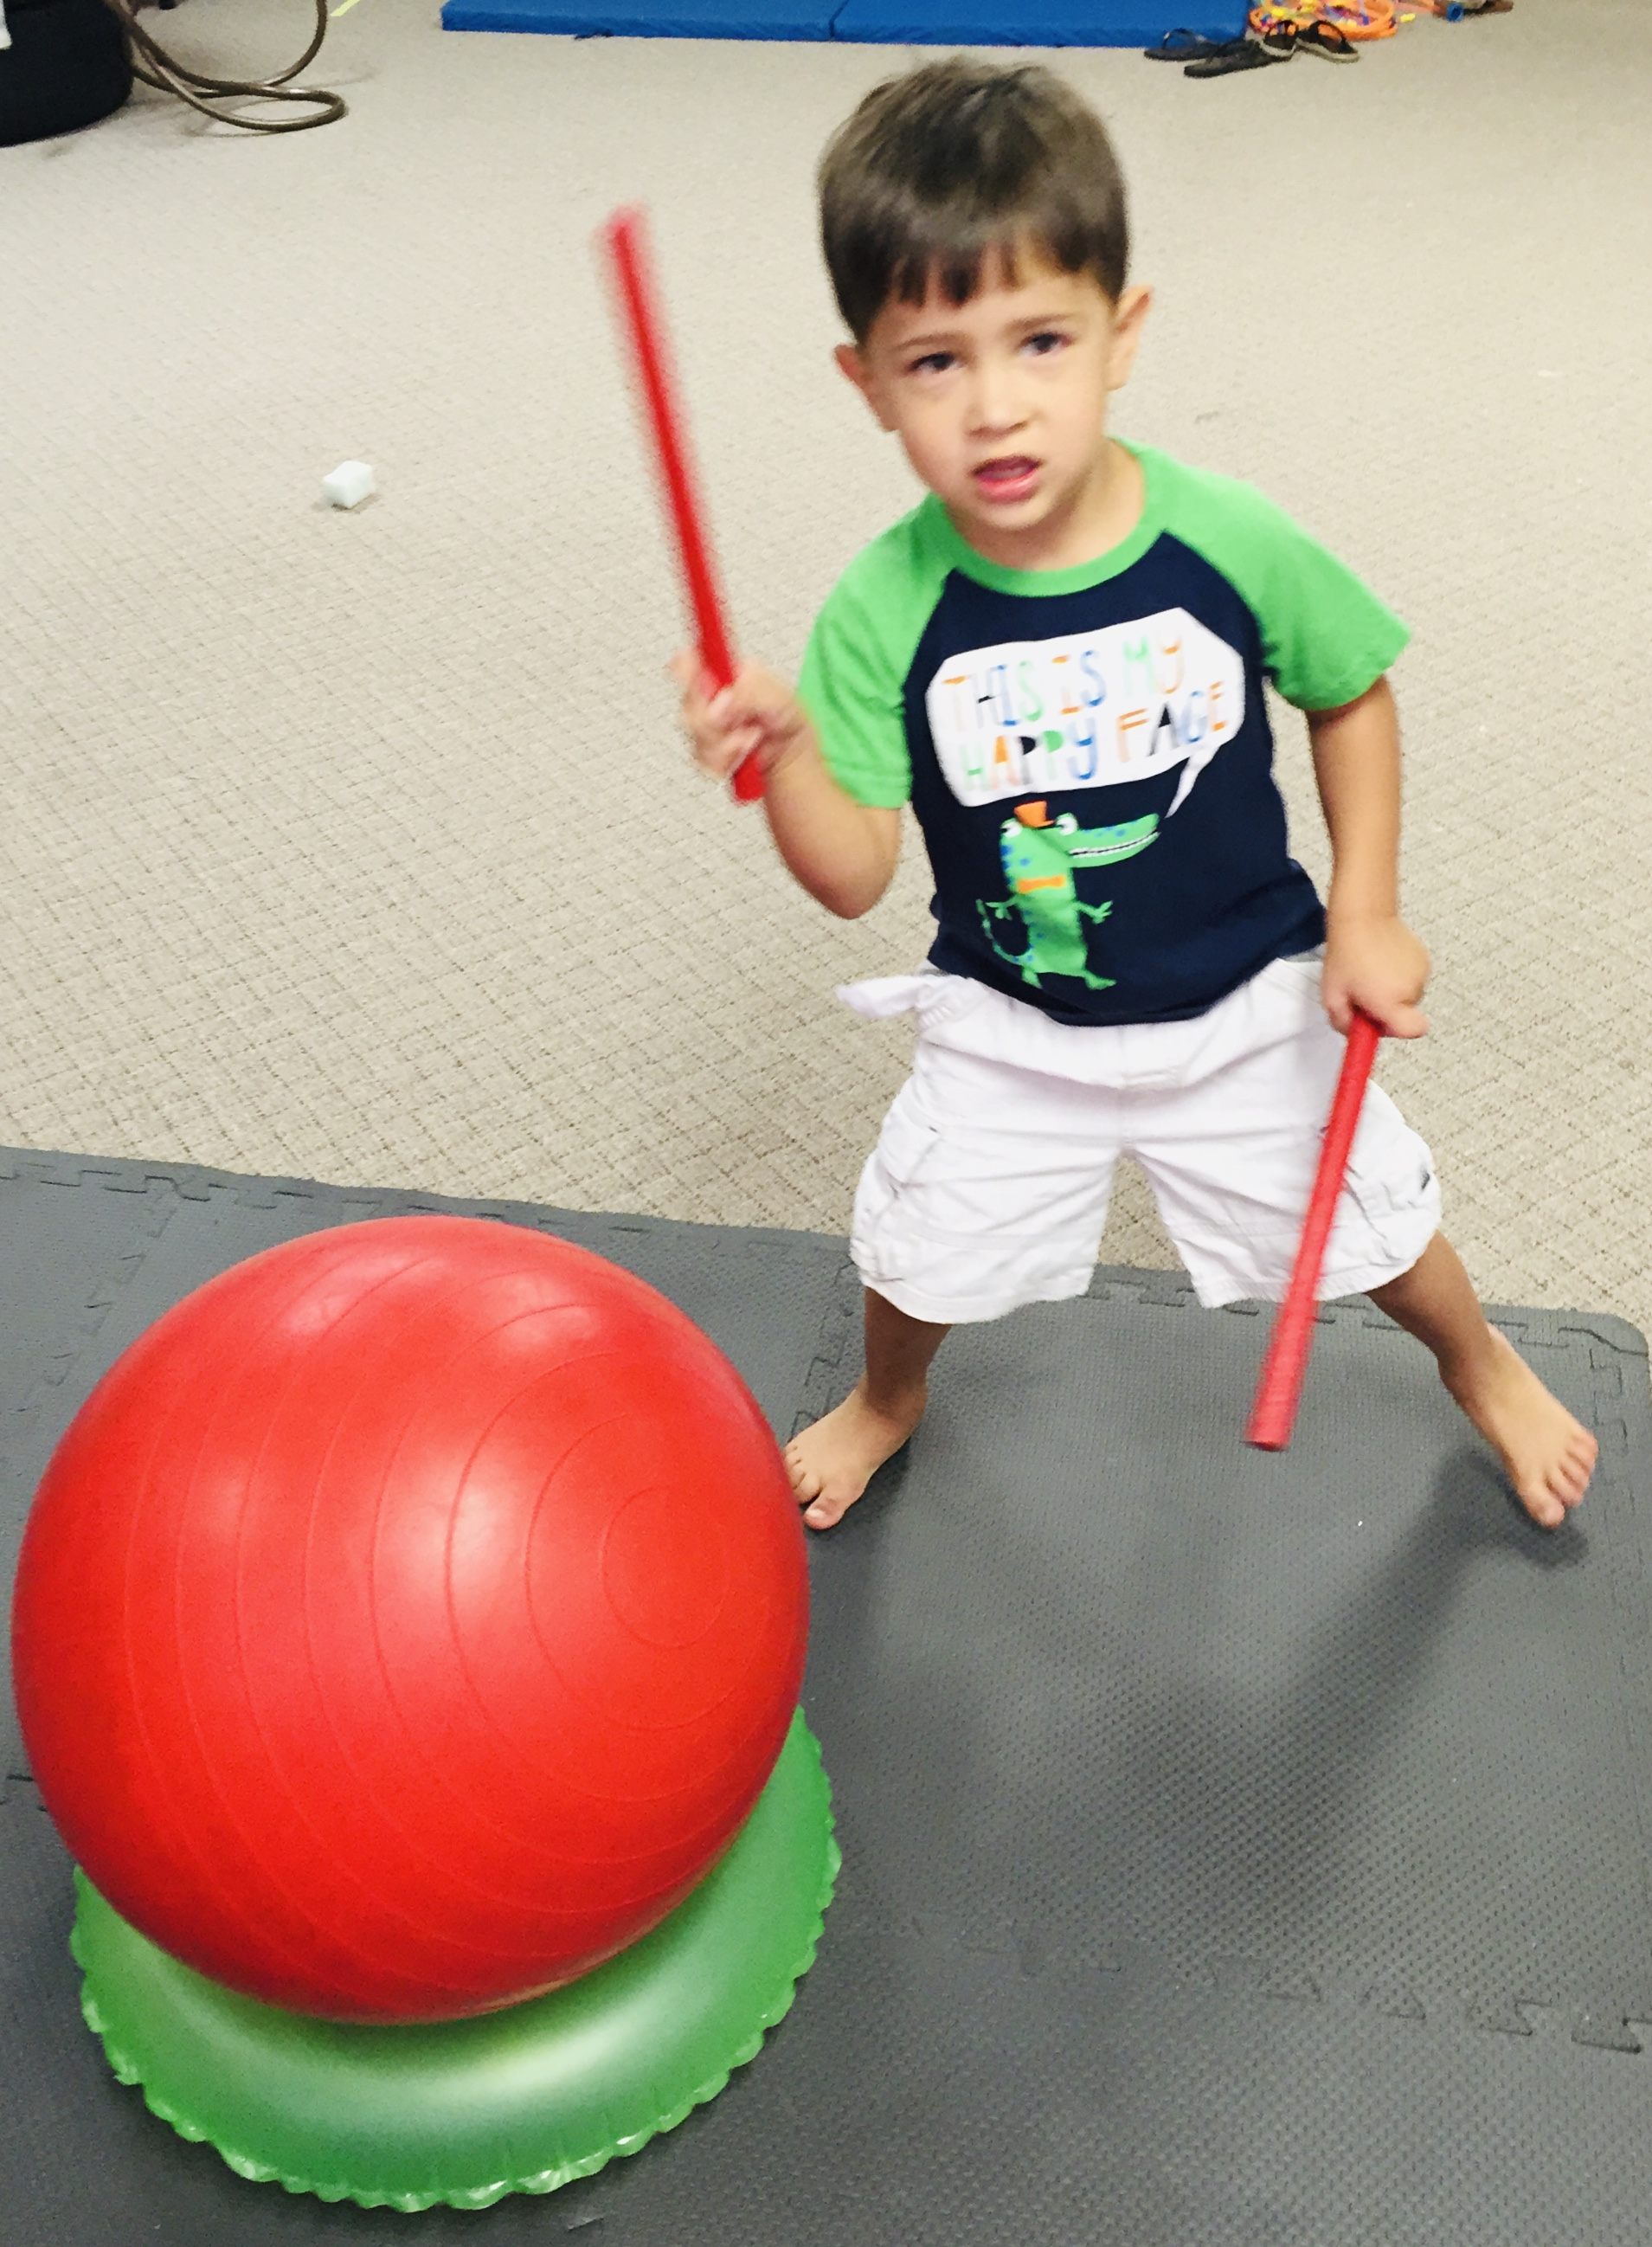 Boy hitting yoga ball with drumsticks